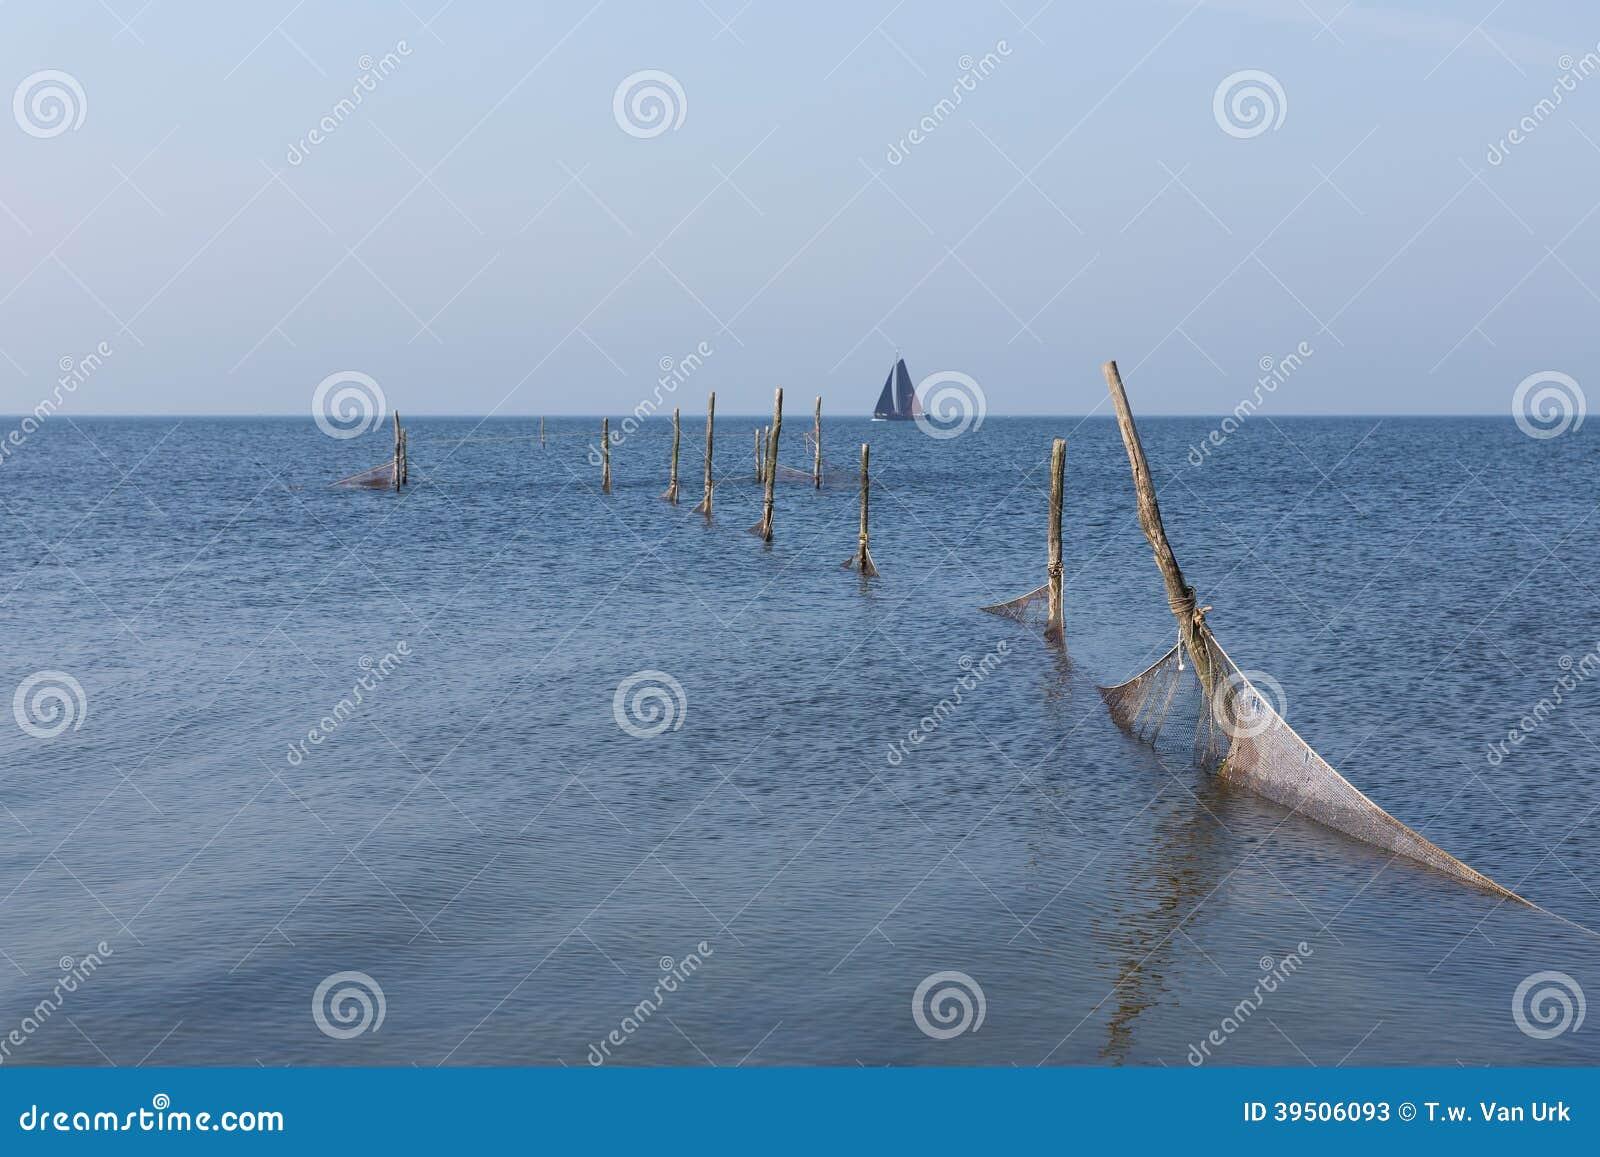 Dutch sea with fishing nets